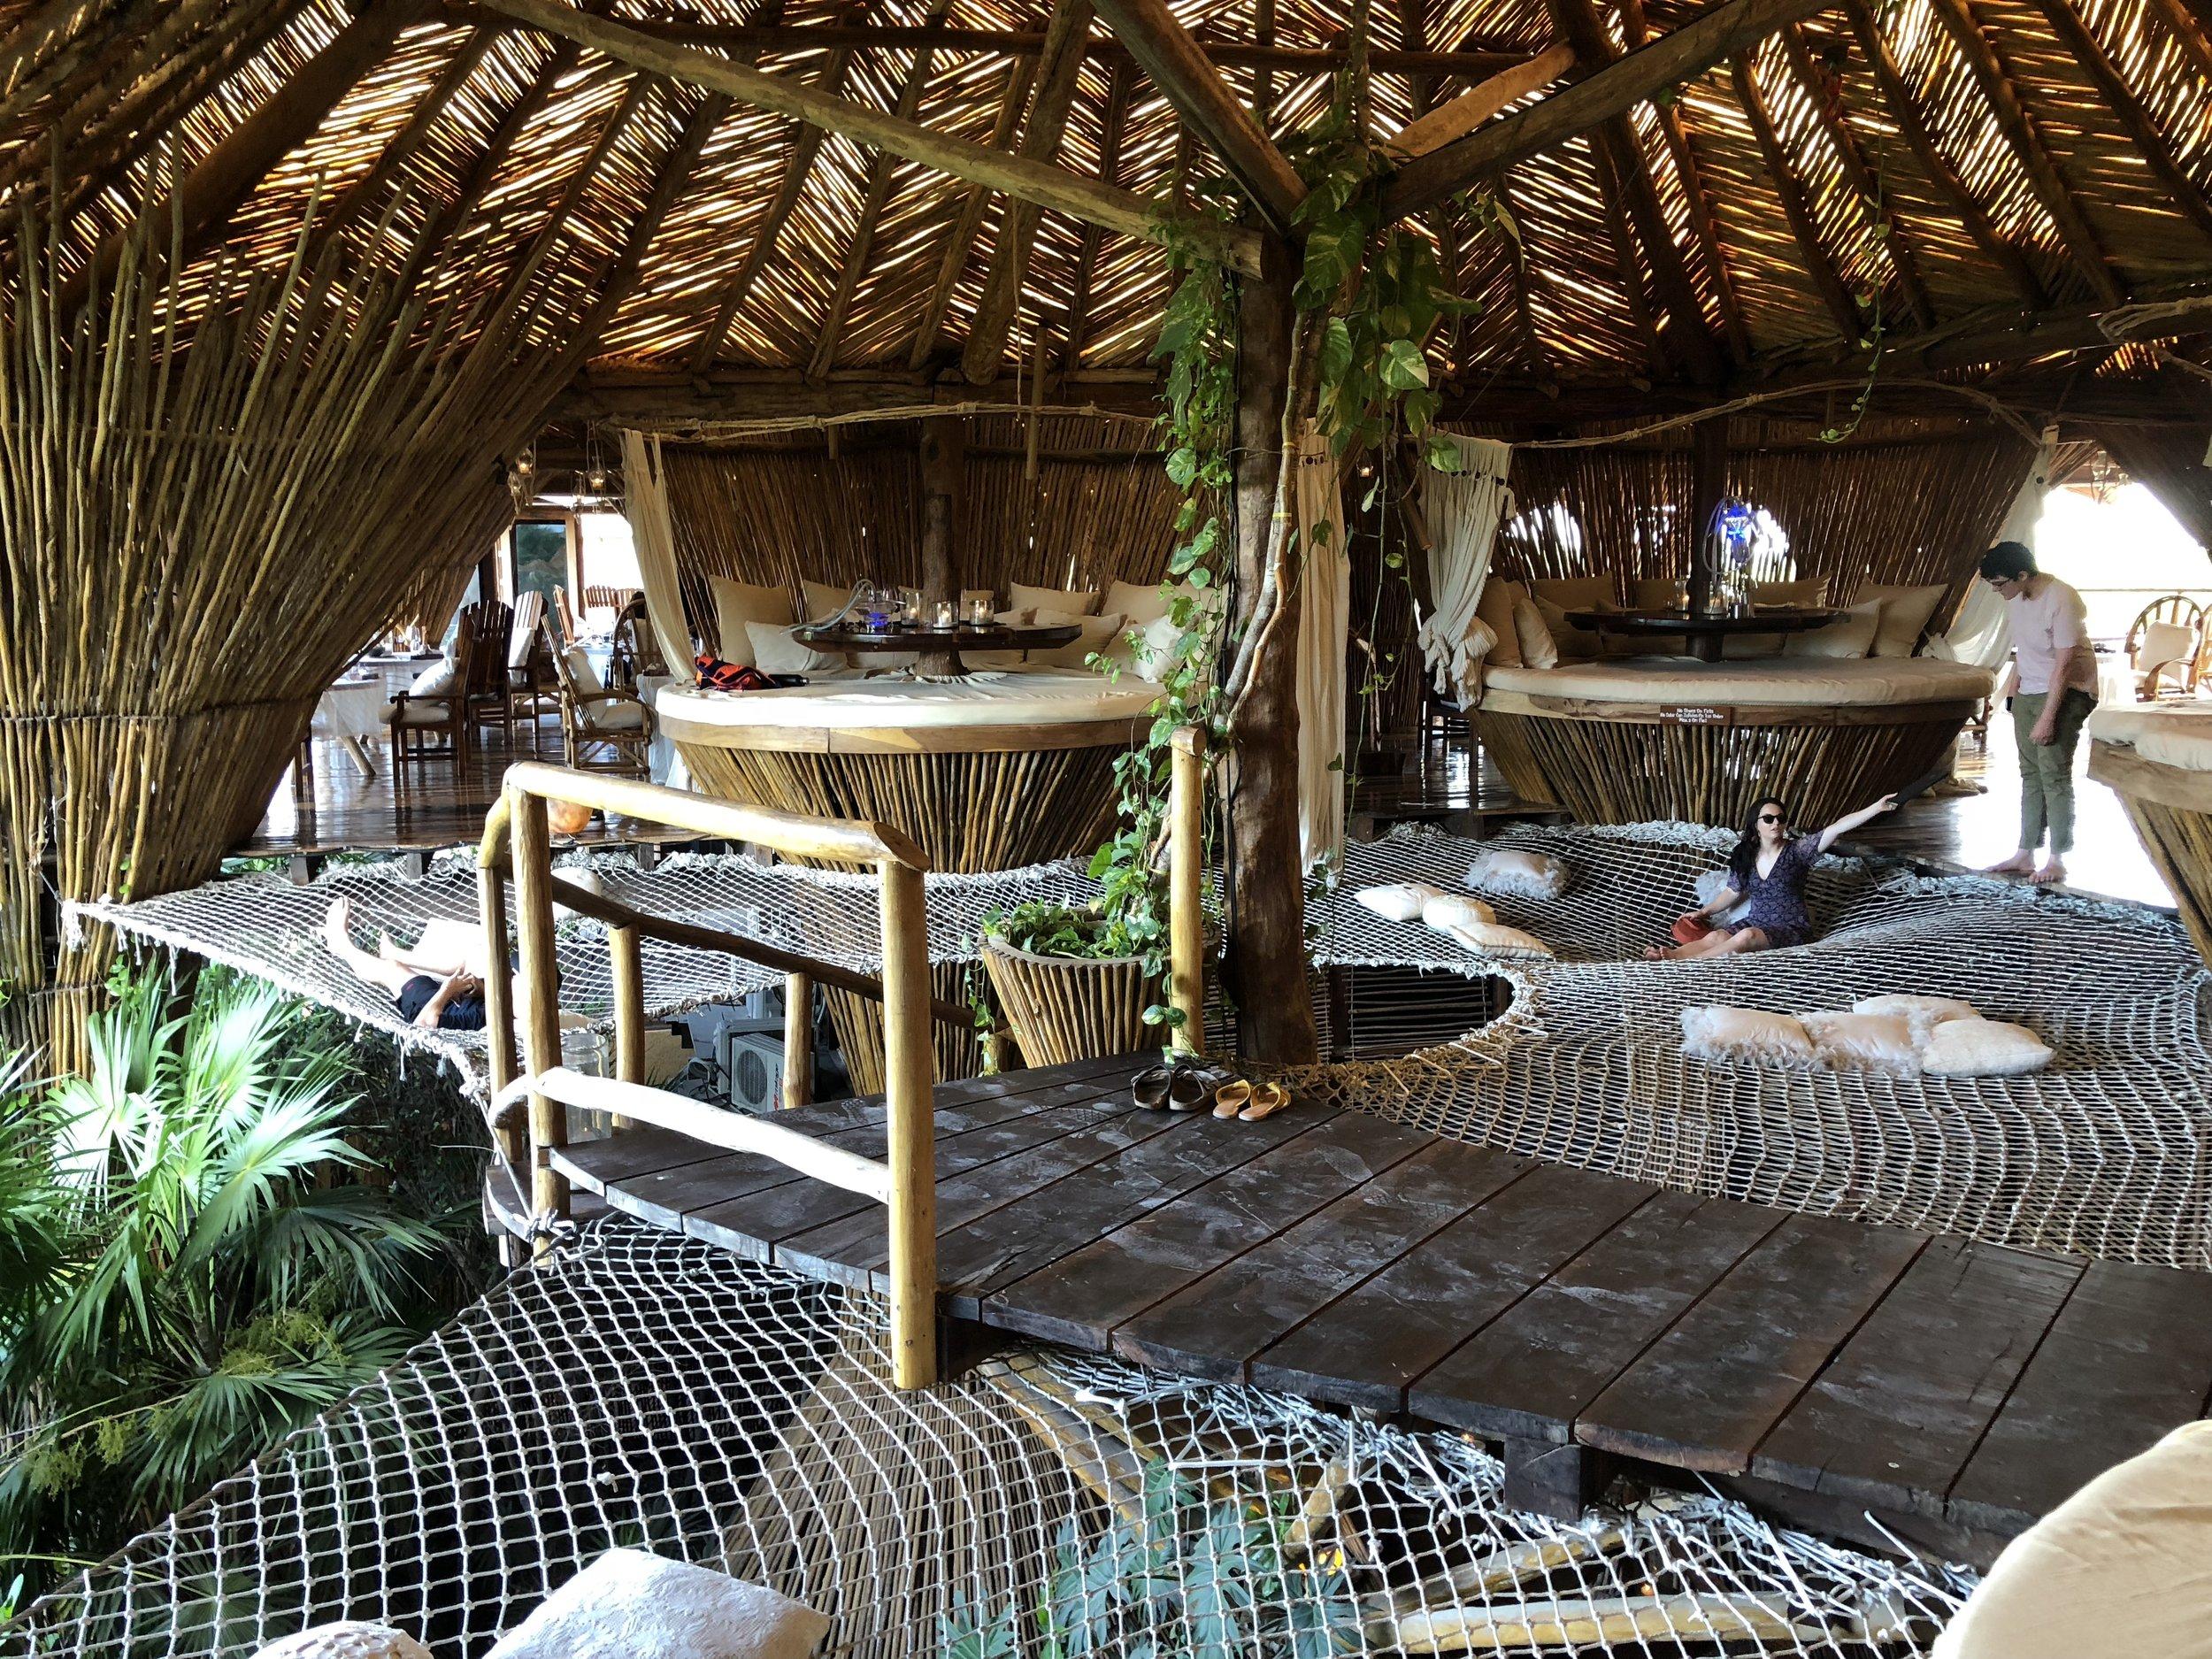 Kin Toh restaurent in Tulum